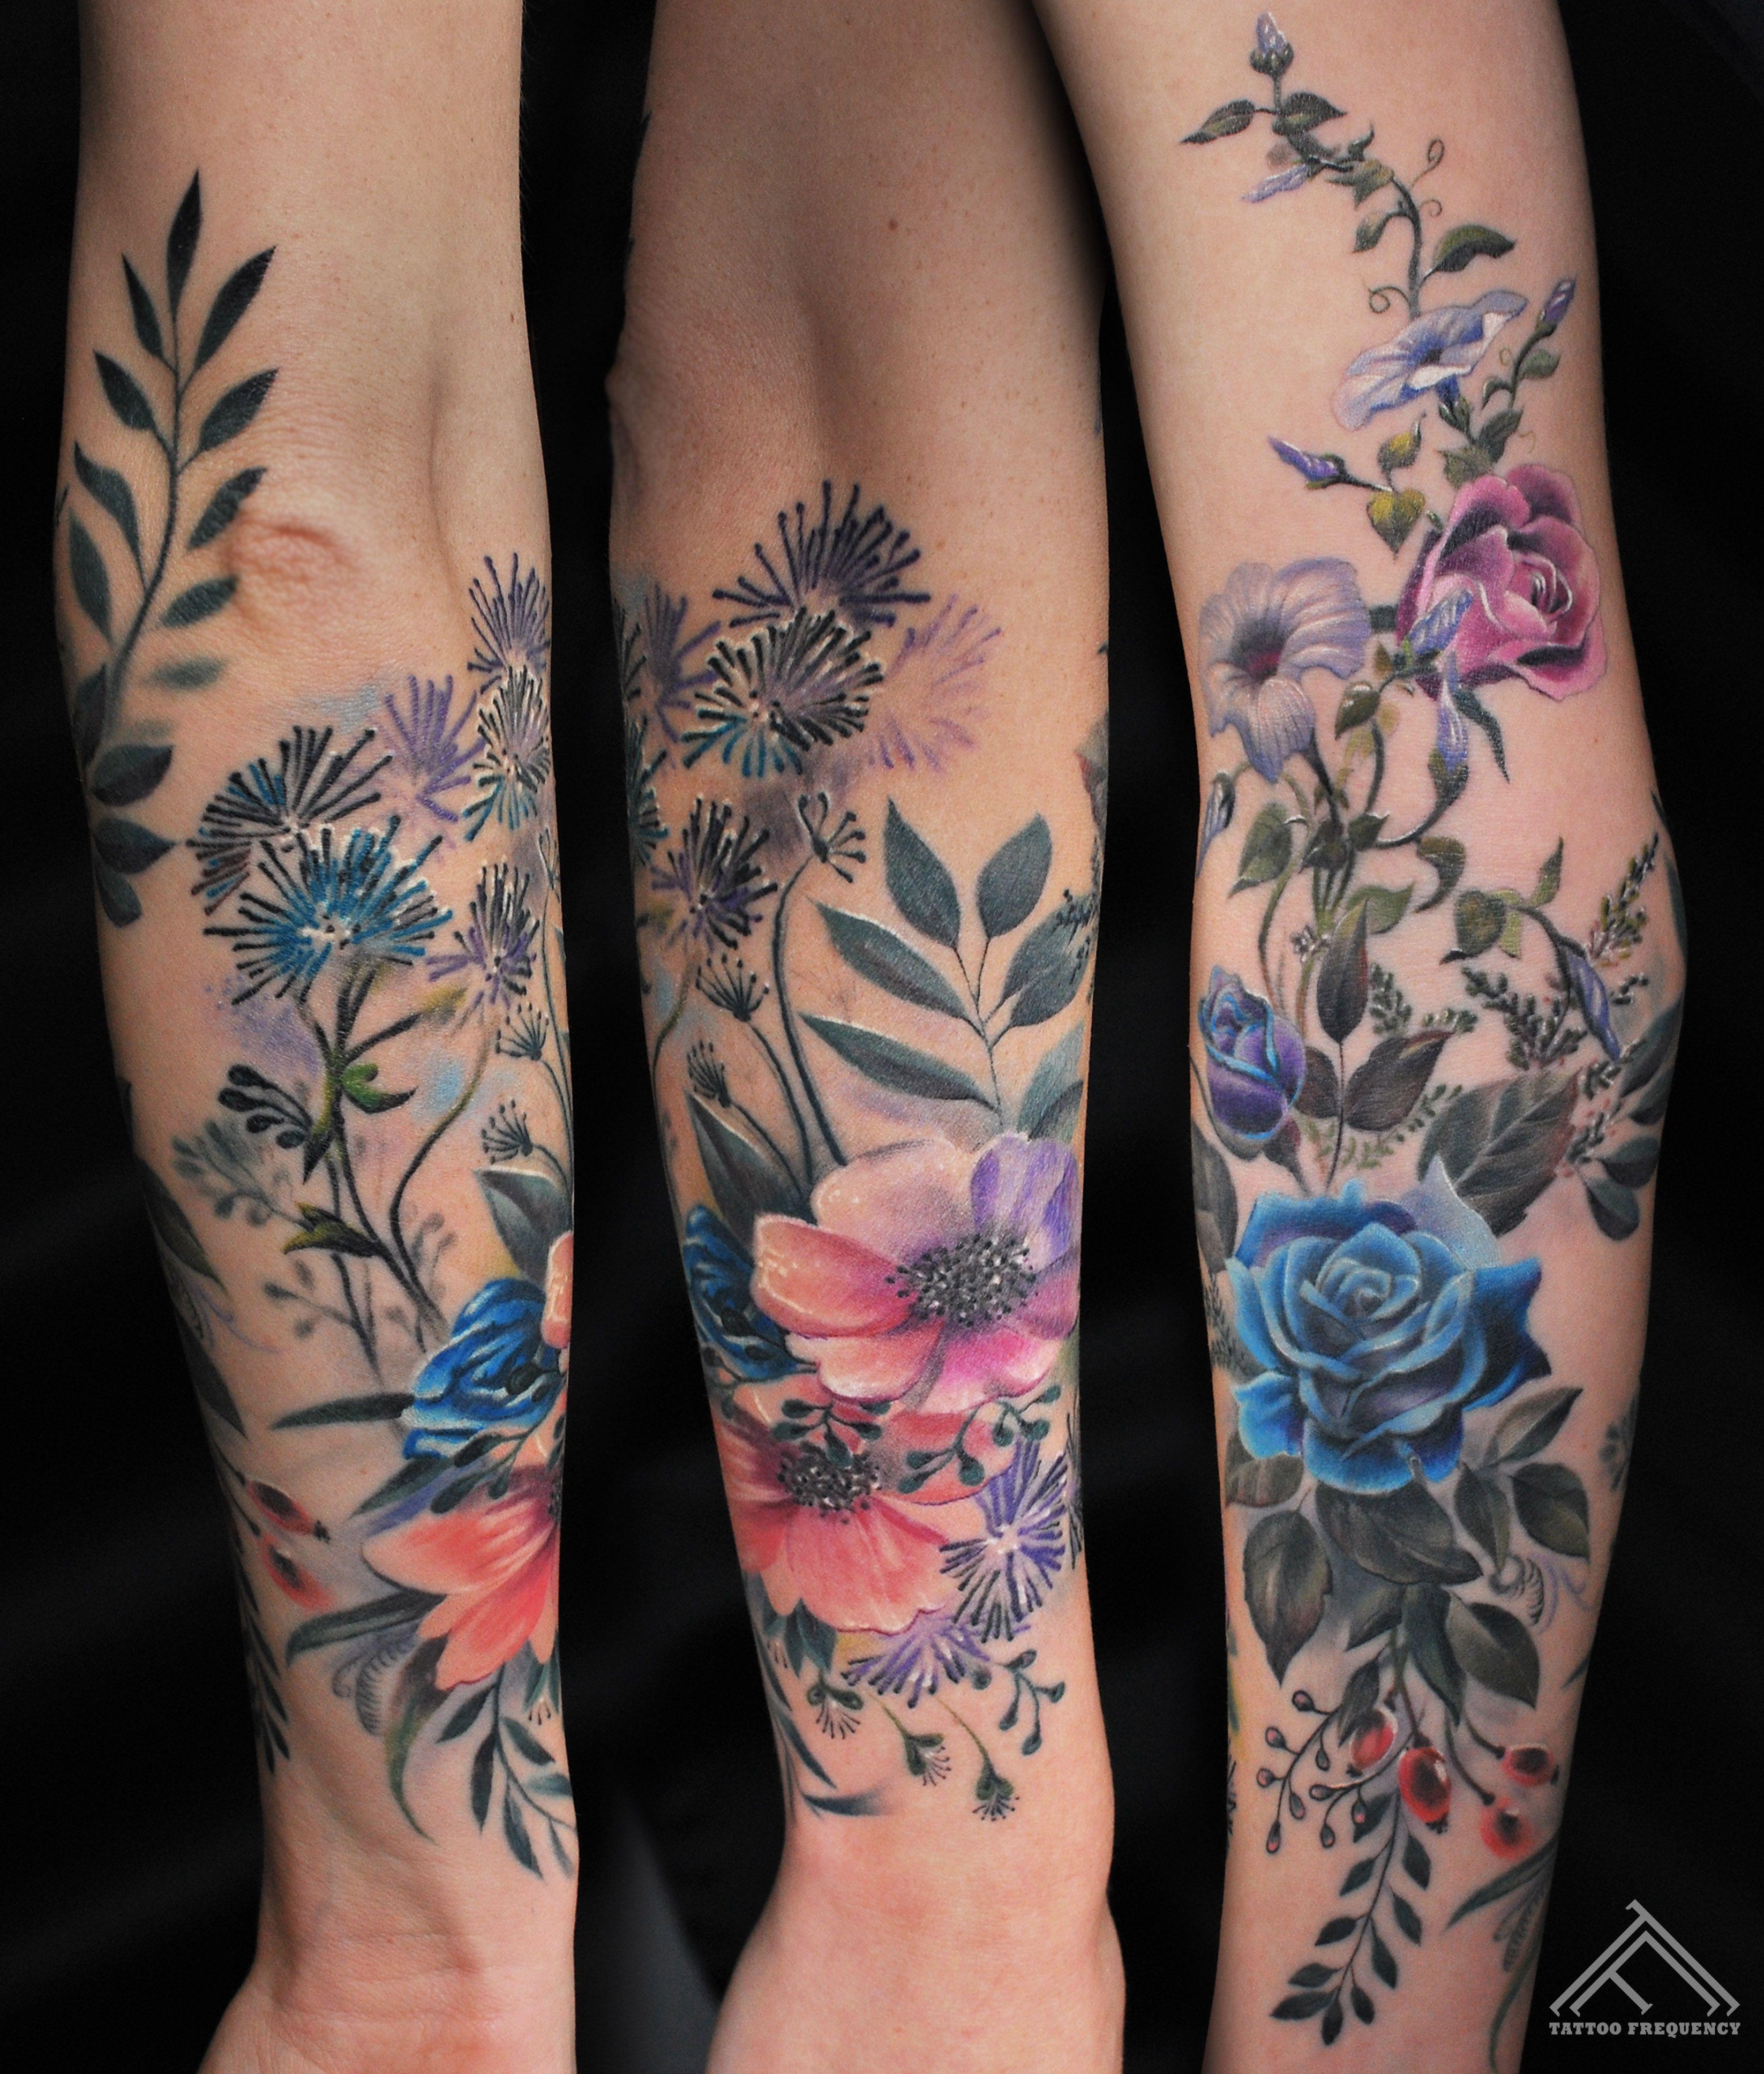 Colorful Flowers On Womans Arm Artist Maris Pavlo Flower Flowertattoo Tattoo Tatuagens Elegantes Tatuagem De Flor Colorida Tatuagem Braco Inteiro Feminino